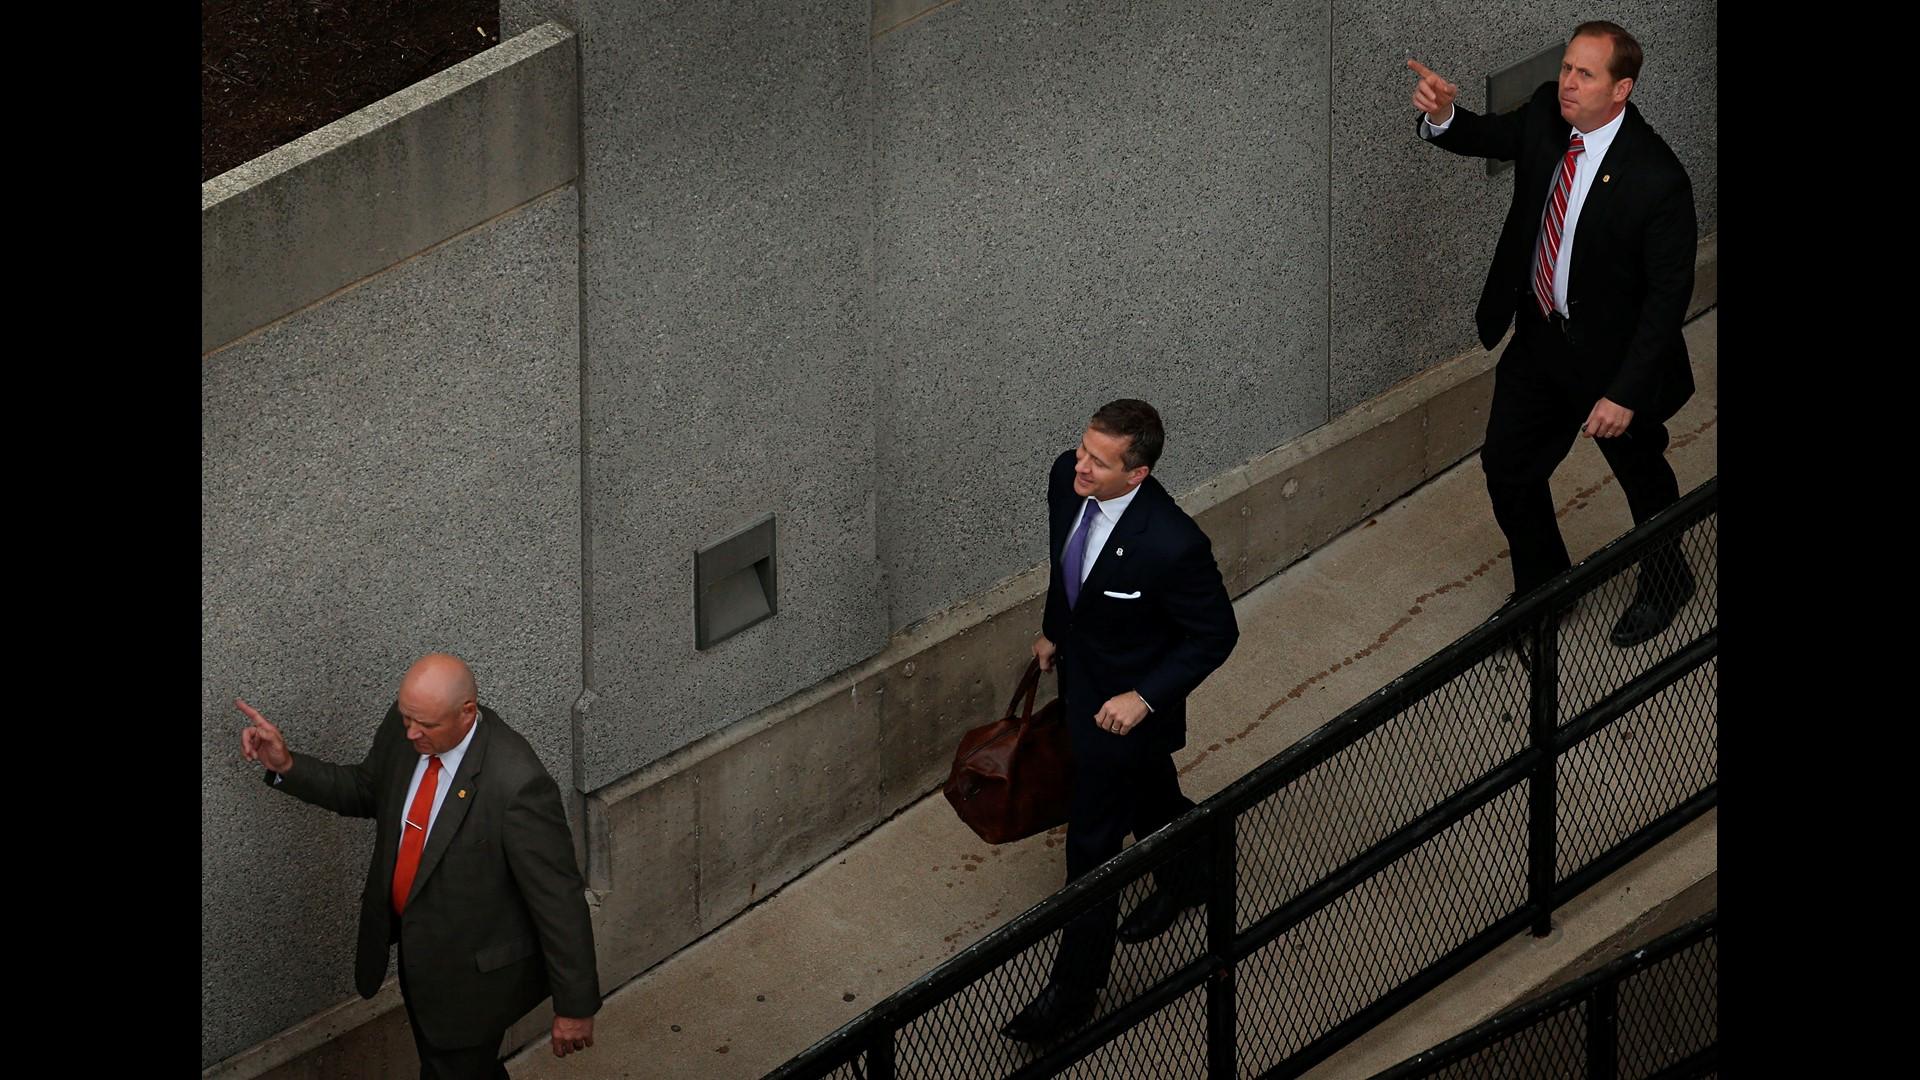 The Latest: Missouri Gov. Eric Greitens to talk to media